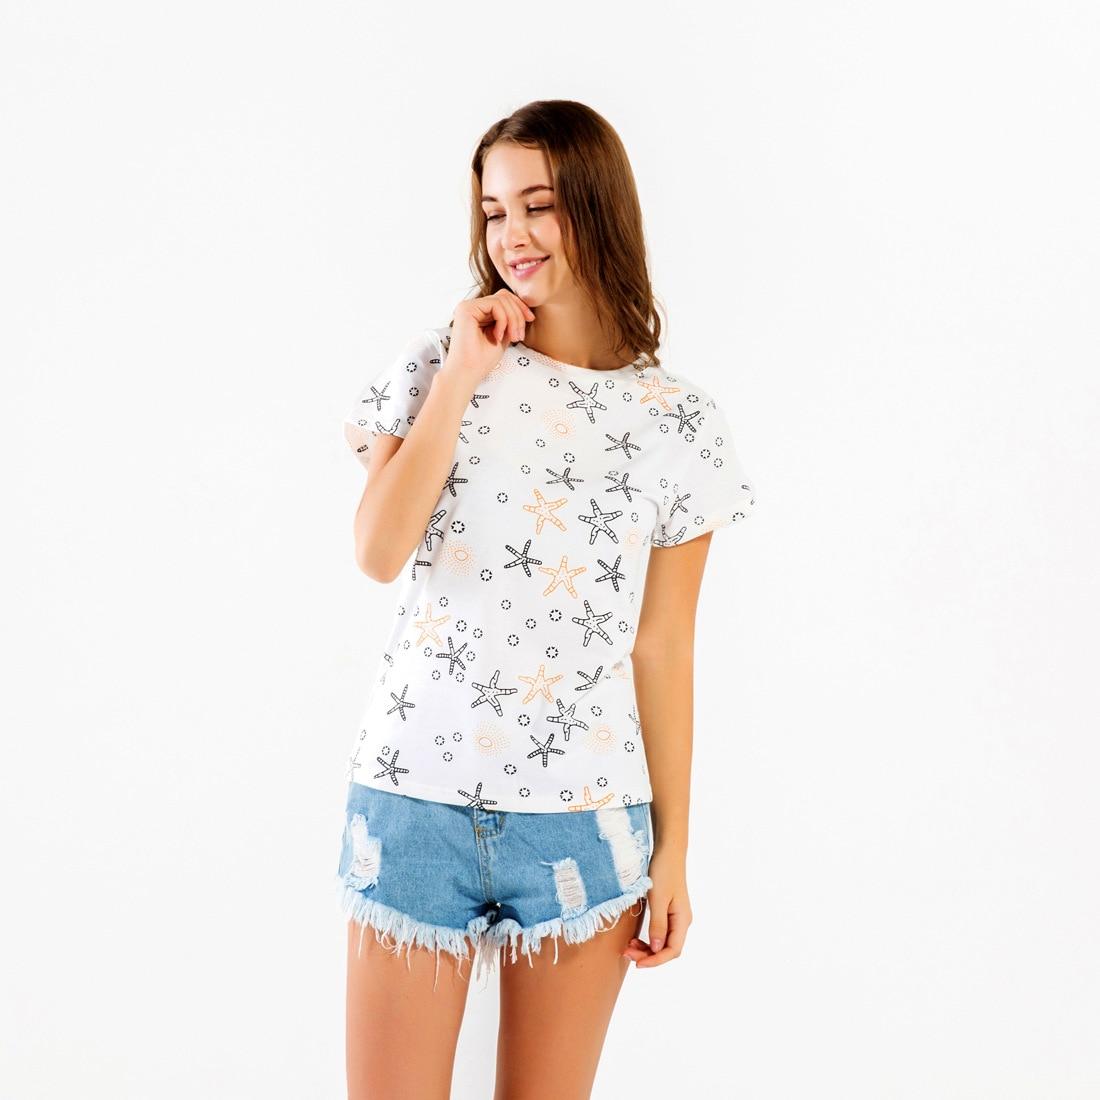 New Women T-shirts Casual Love Printed Tops Tee Summer Female T Shirt Short Sleeve T Shirt For Women Clothing KZH